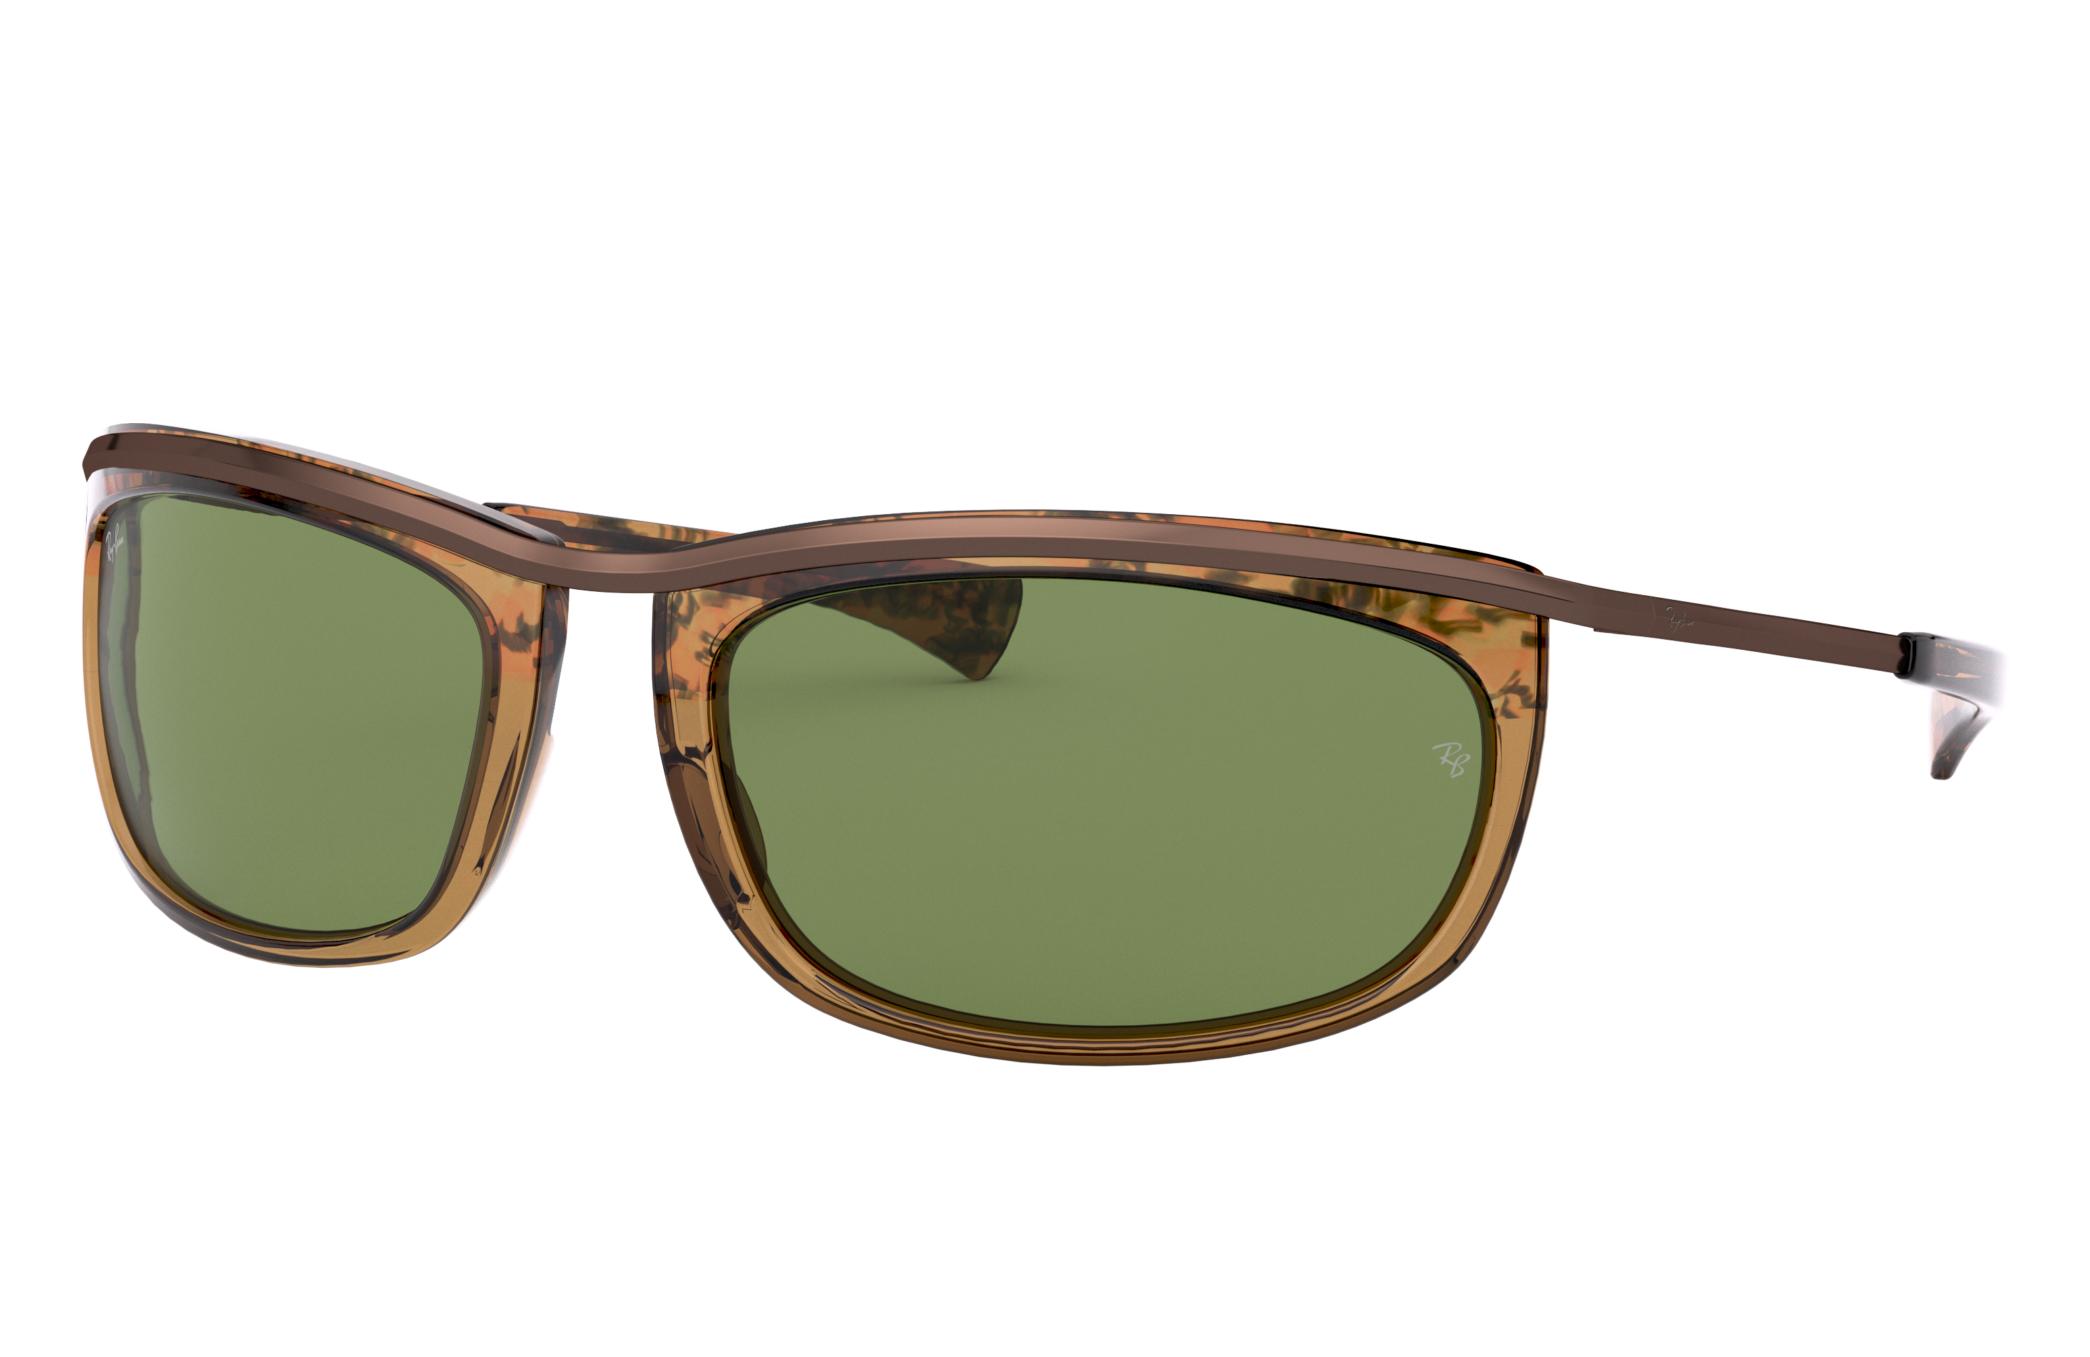 Ray-Ban Olympian I Tortoise, Green Lenses - RB2319